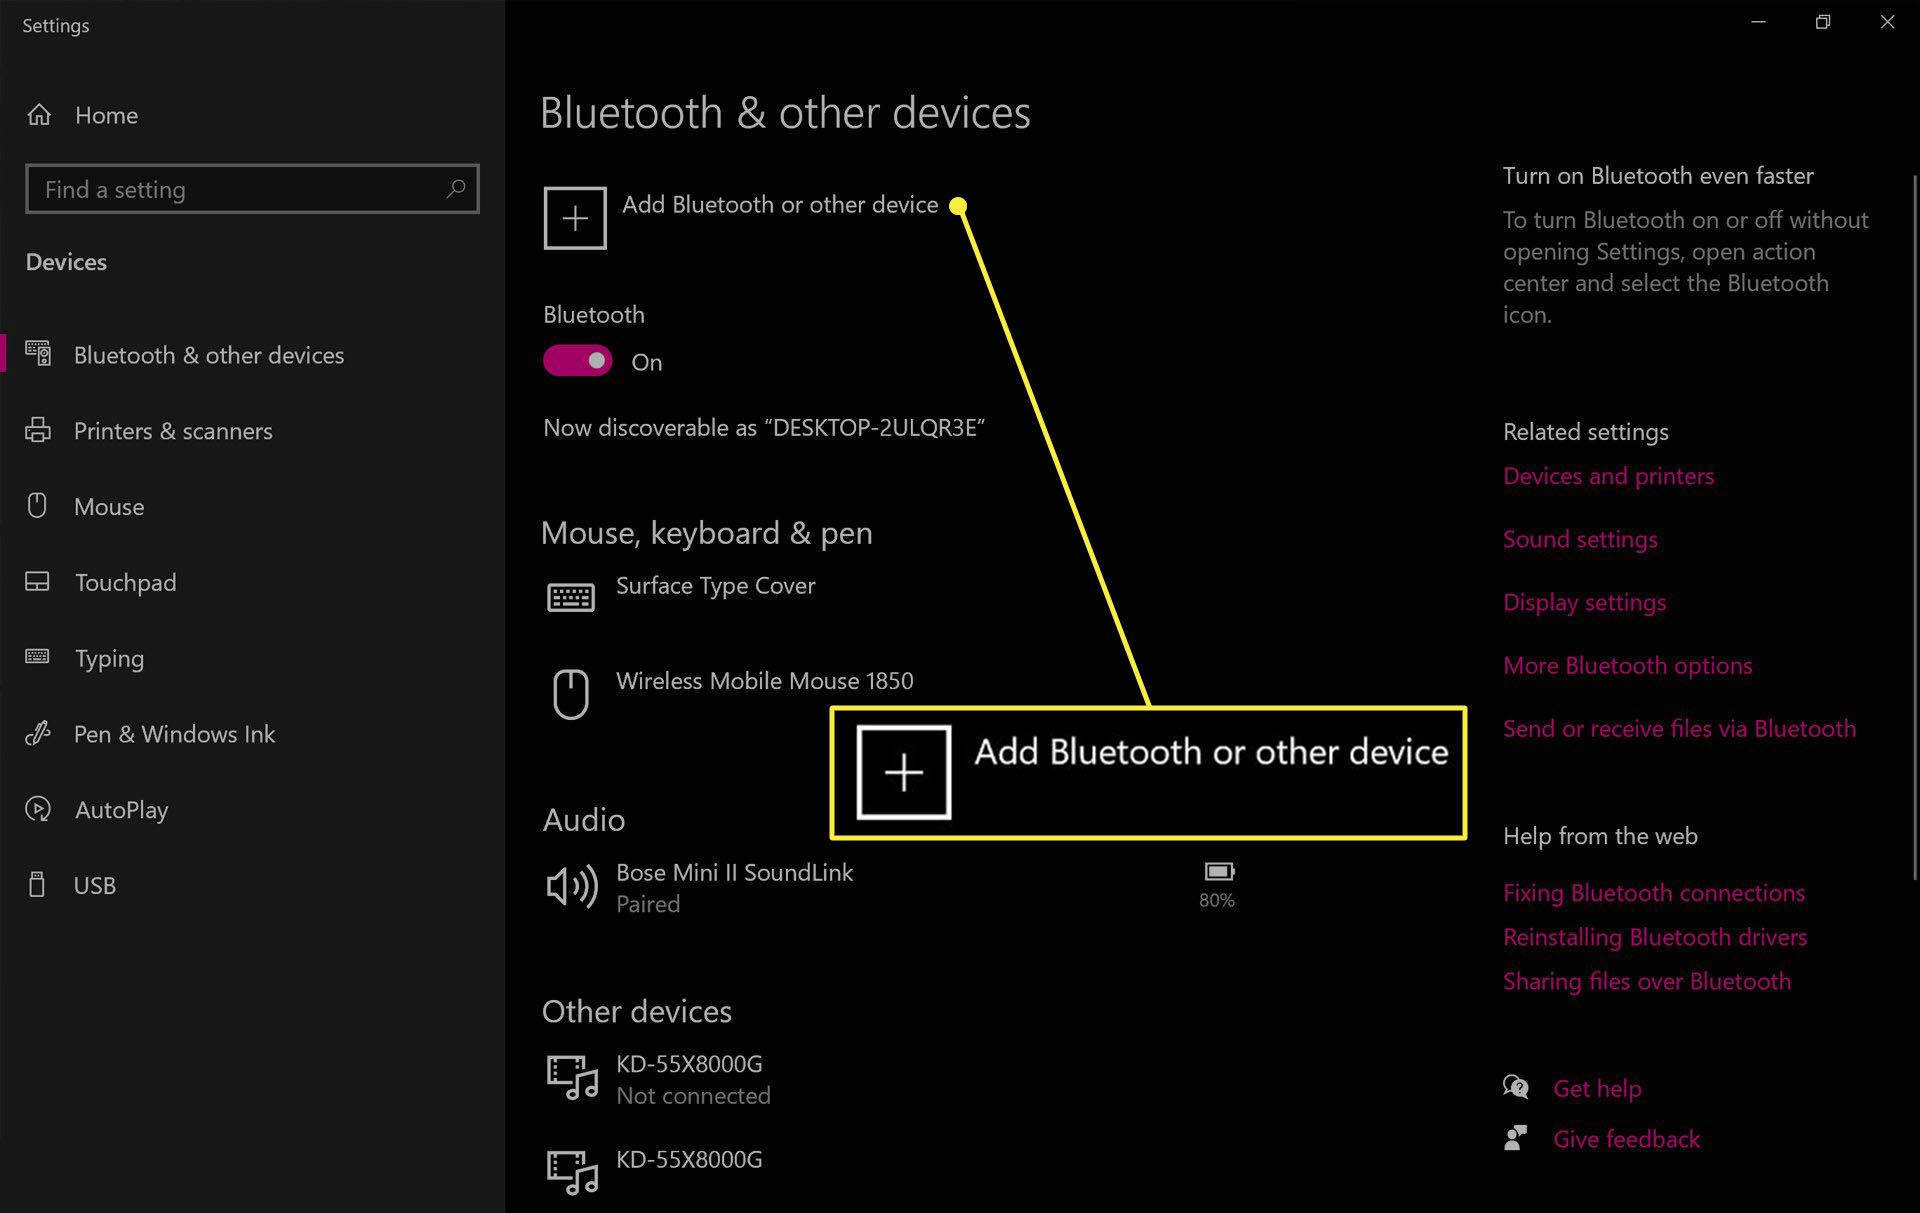 Windows 10 Bluetooth settings.